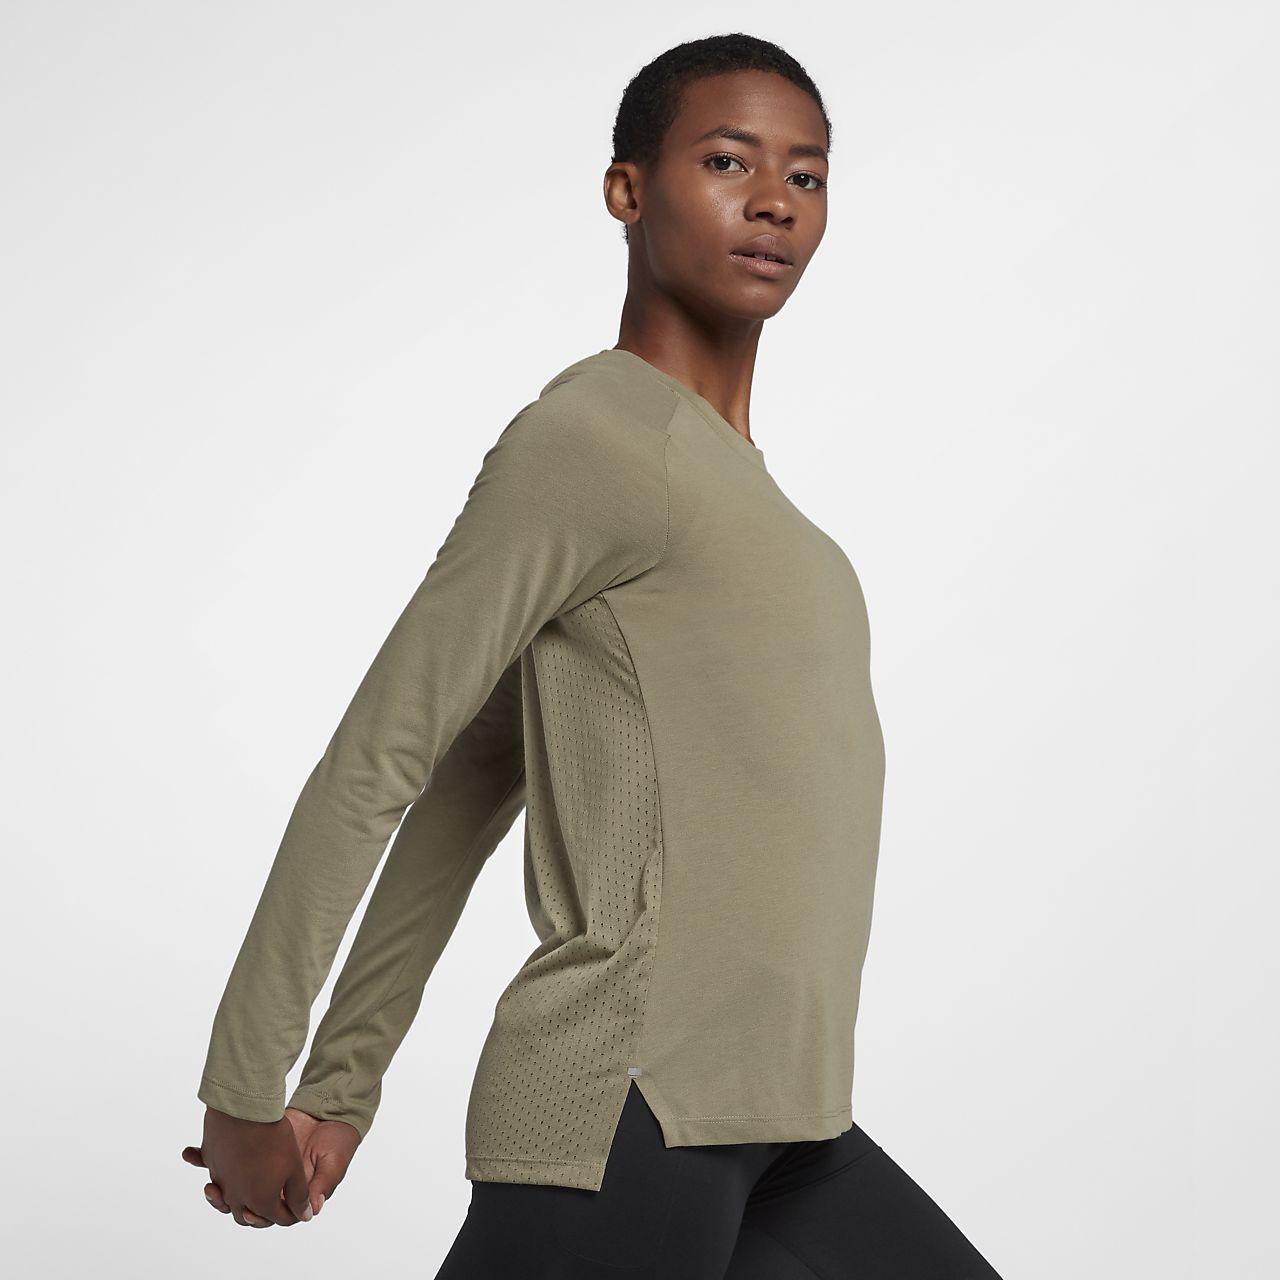 d29ebedfe6e15 Nike Tailwind Women s Long Sleeve Running Top. Nike.com